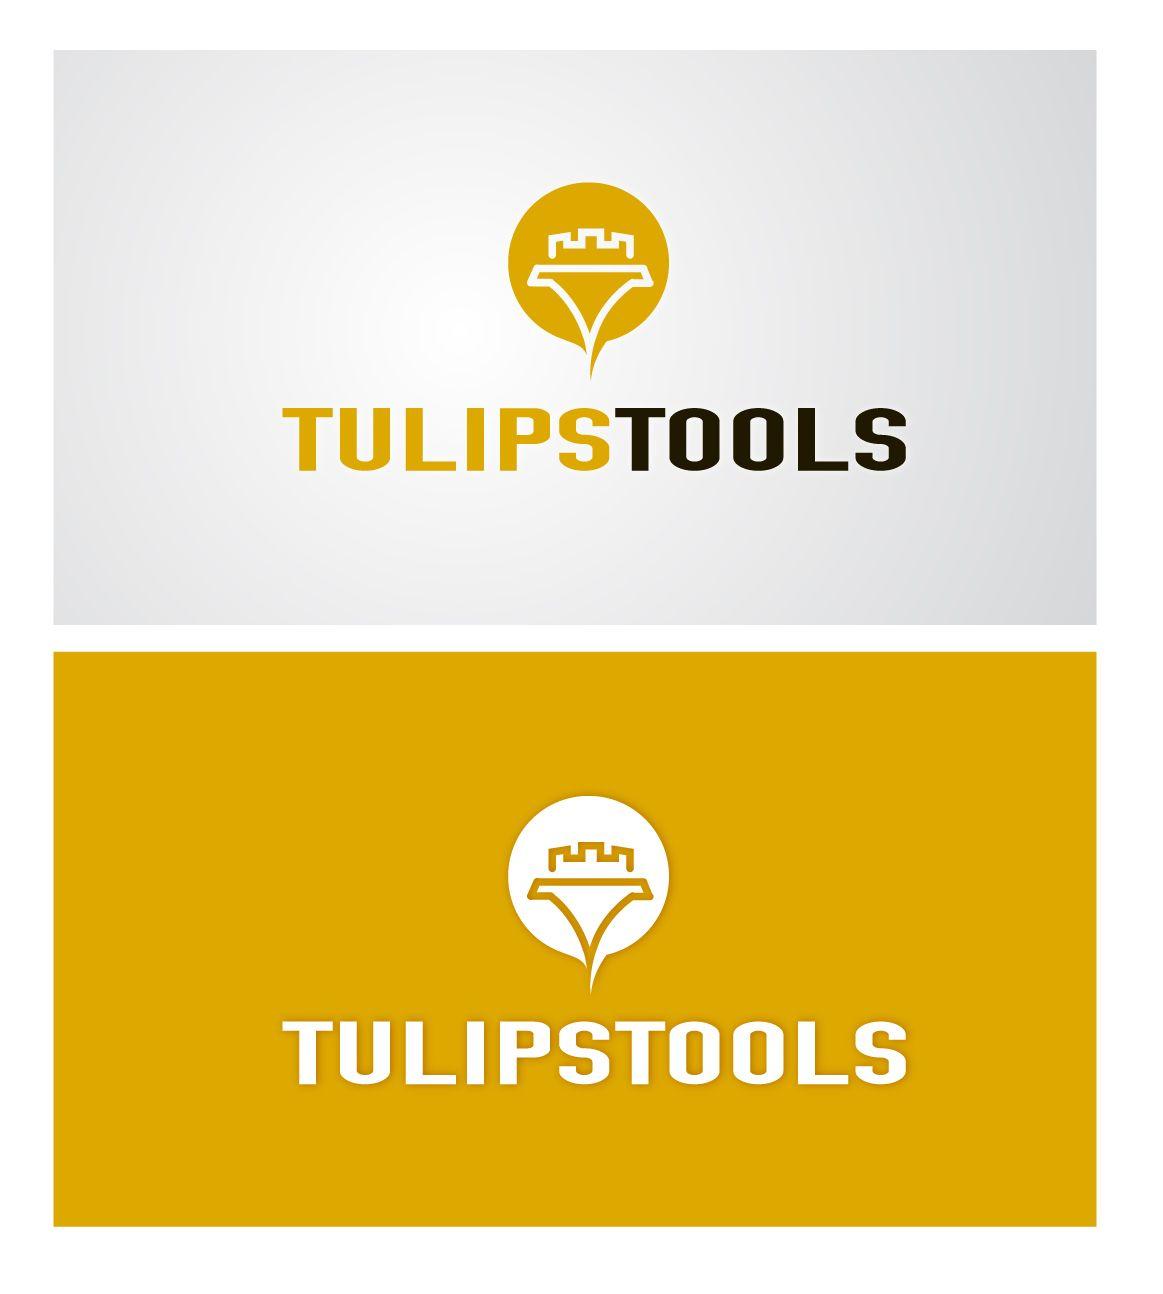 Tulips - дизайнер Kov-veronika